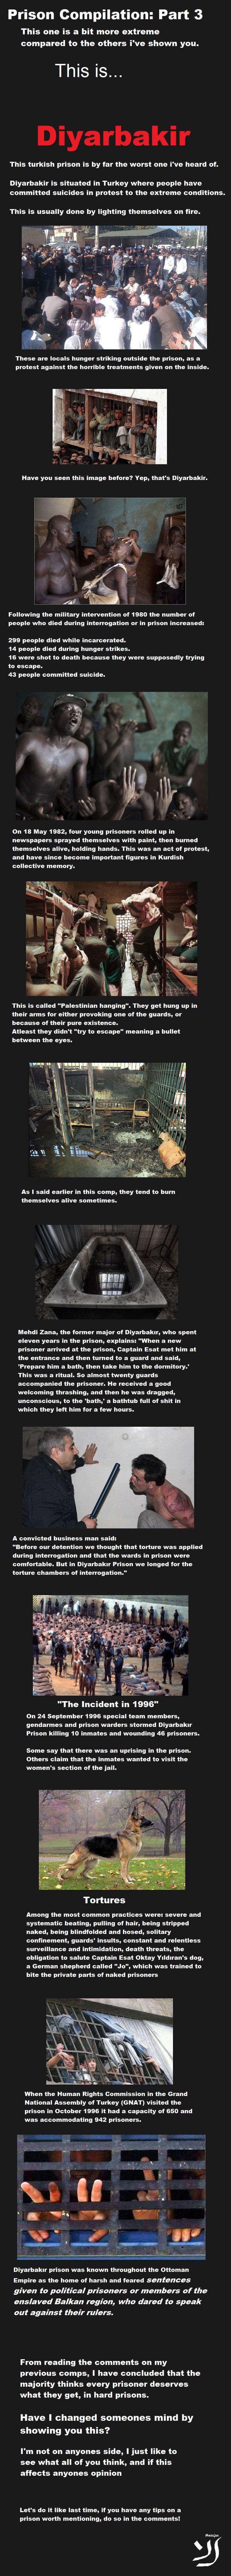 Prison Compilation Part 3: Turkey. Norway - Part 1: /Prison+comp+Bastoy+Part+1/funny-pict... Norway - Part 2: /Prison+comp+Bastoy+part+2/funny-pict... Russia -  tough prison Life